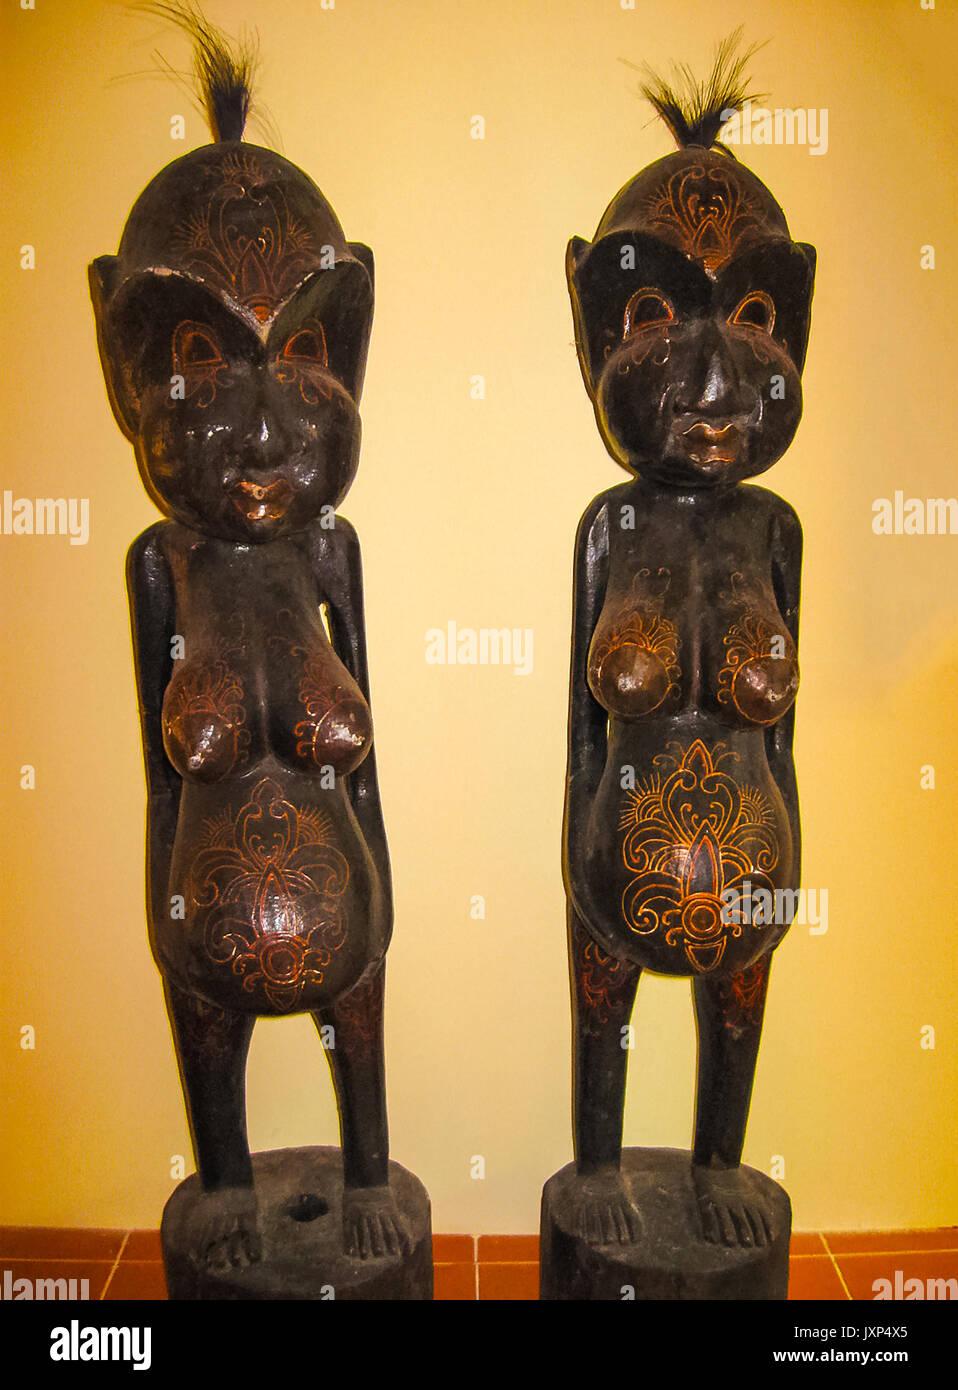 Wooden Figures Bali Indonesia Stock Photos & Wooden Figures Bali ...